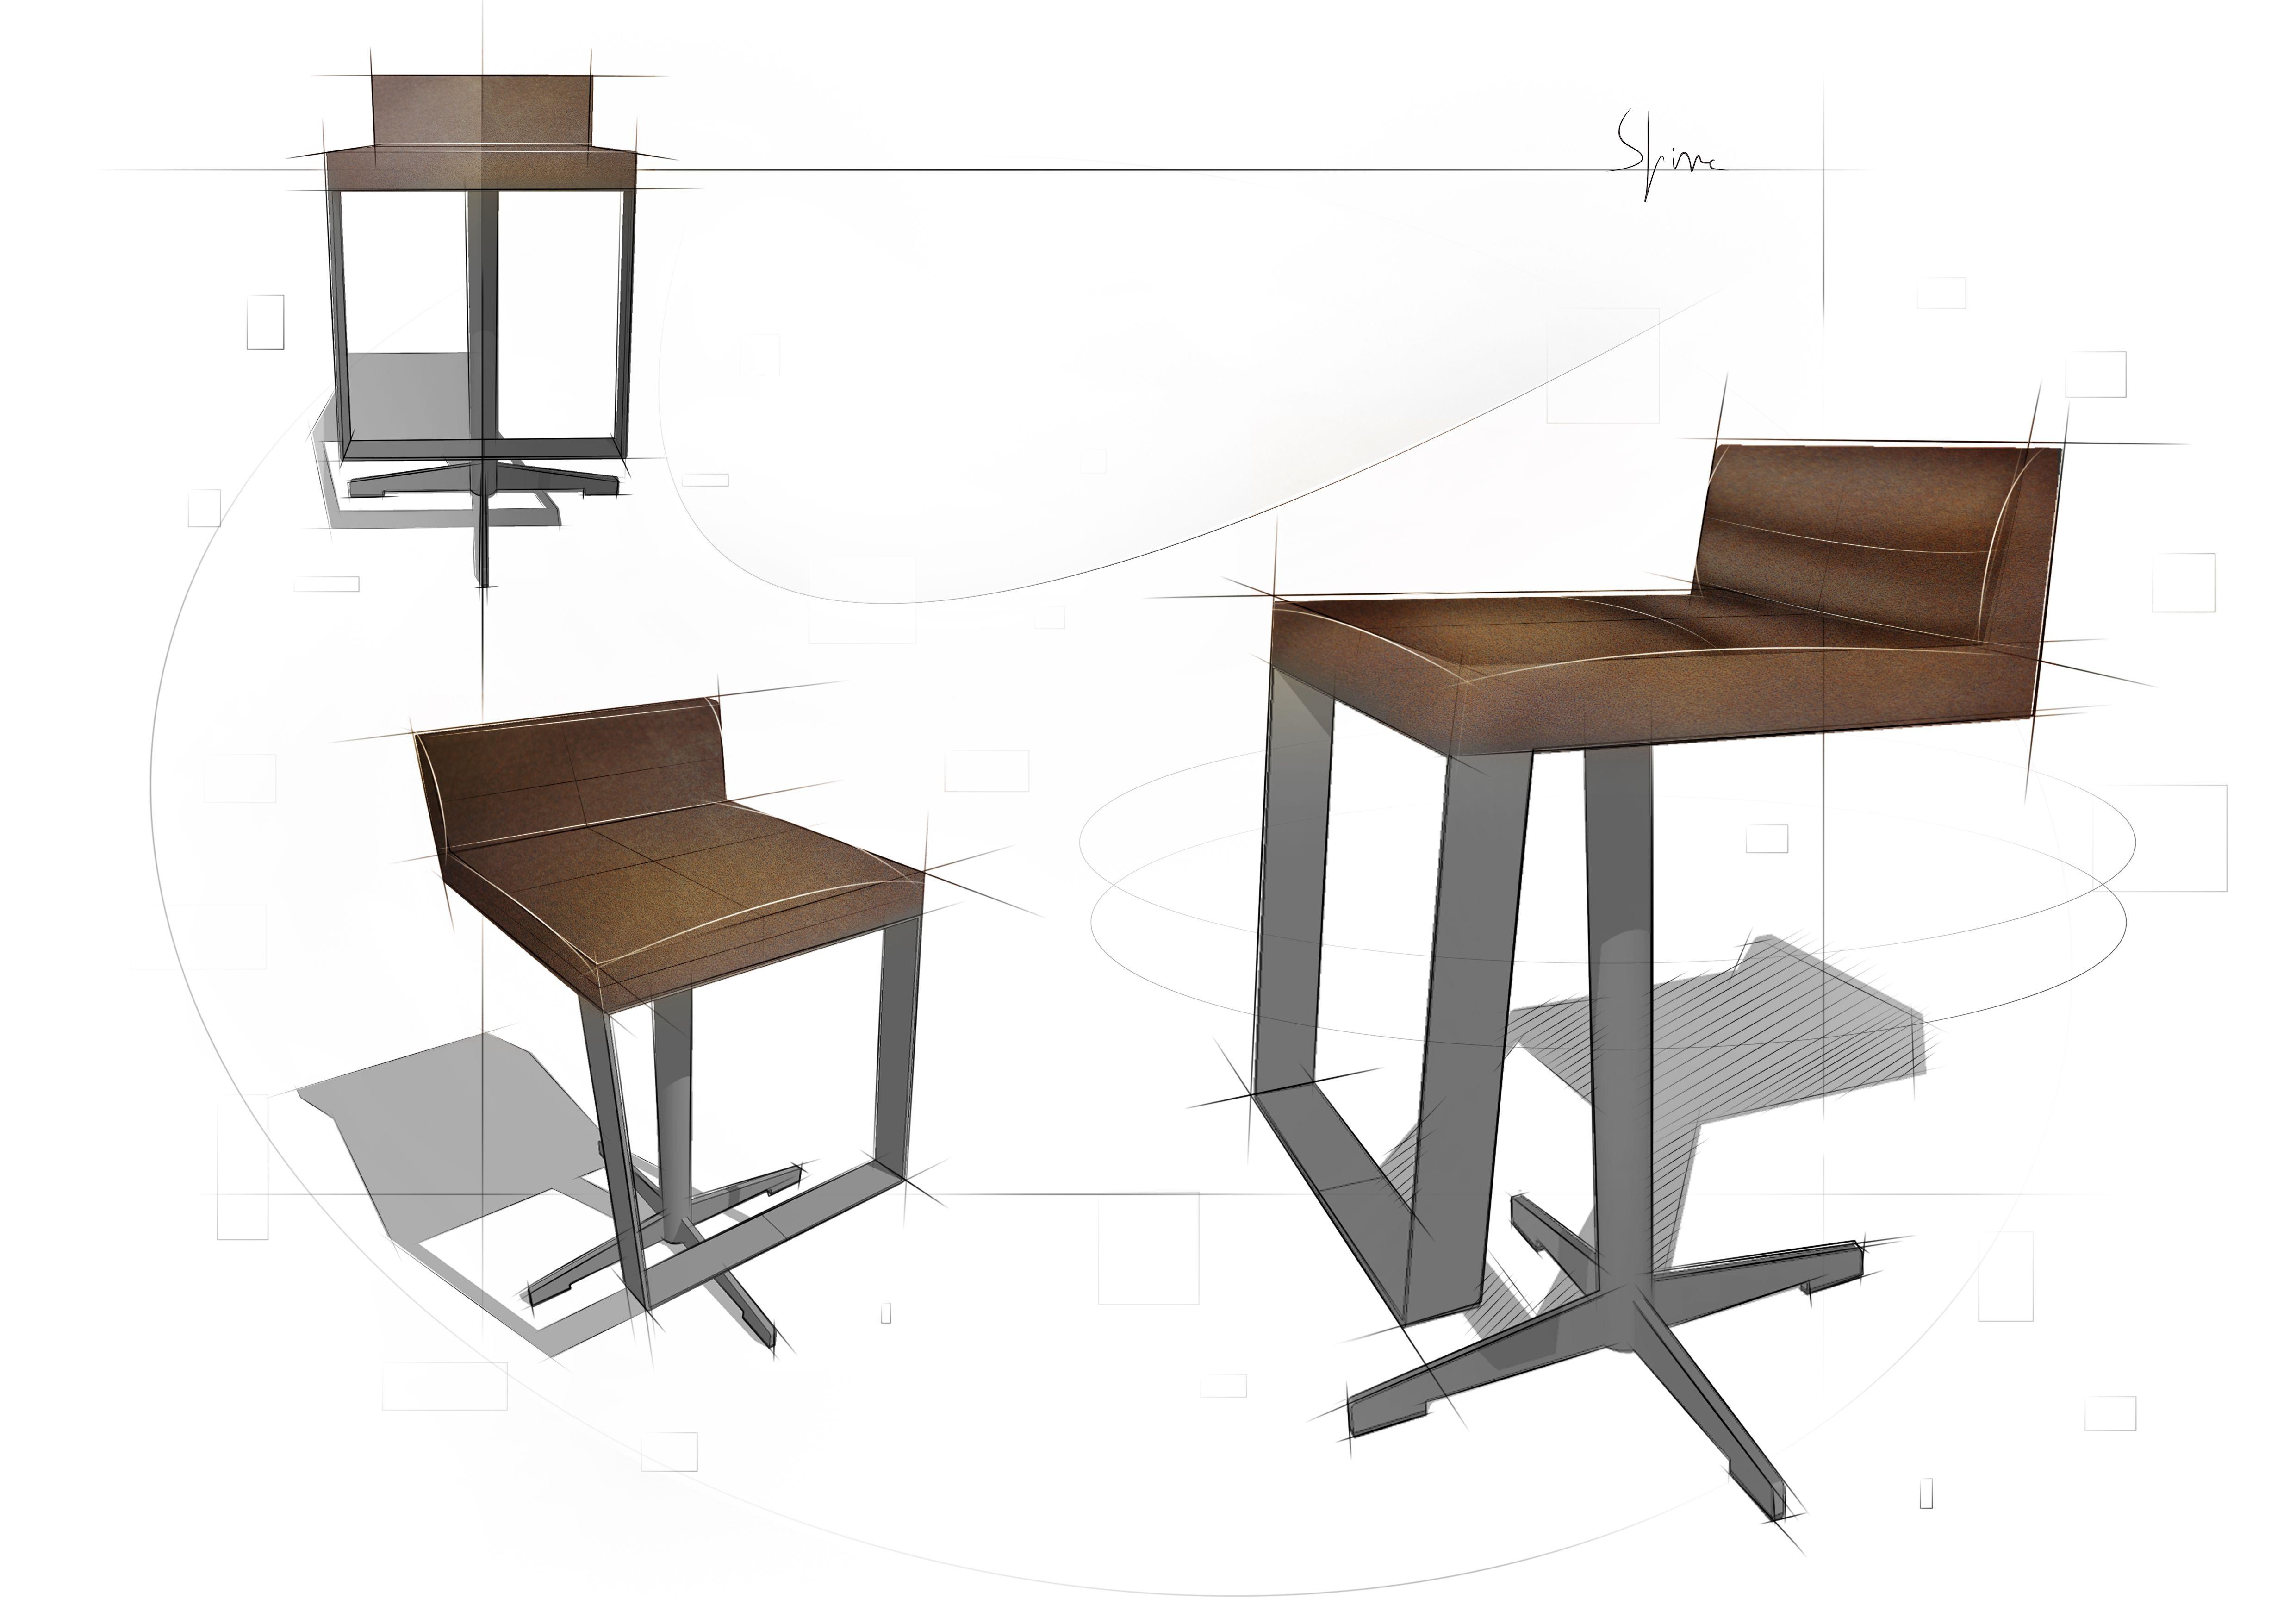 #HIGH #STOOL #DESIGN - @eginstillstudio | Concept design proposal for a high stool for a private client in Amsterdam. #Design @eginstillstudio  by #stefanospinella #stefano #spinella #spino #design #spinodesign #amsterdam #eginstill #concept